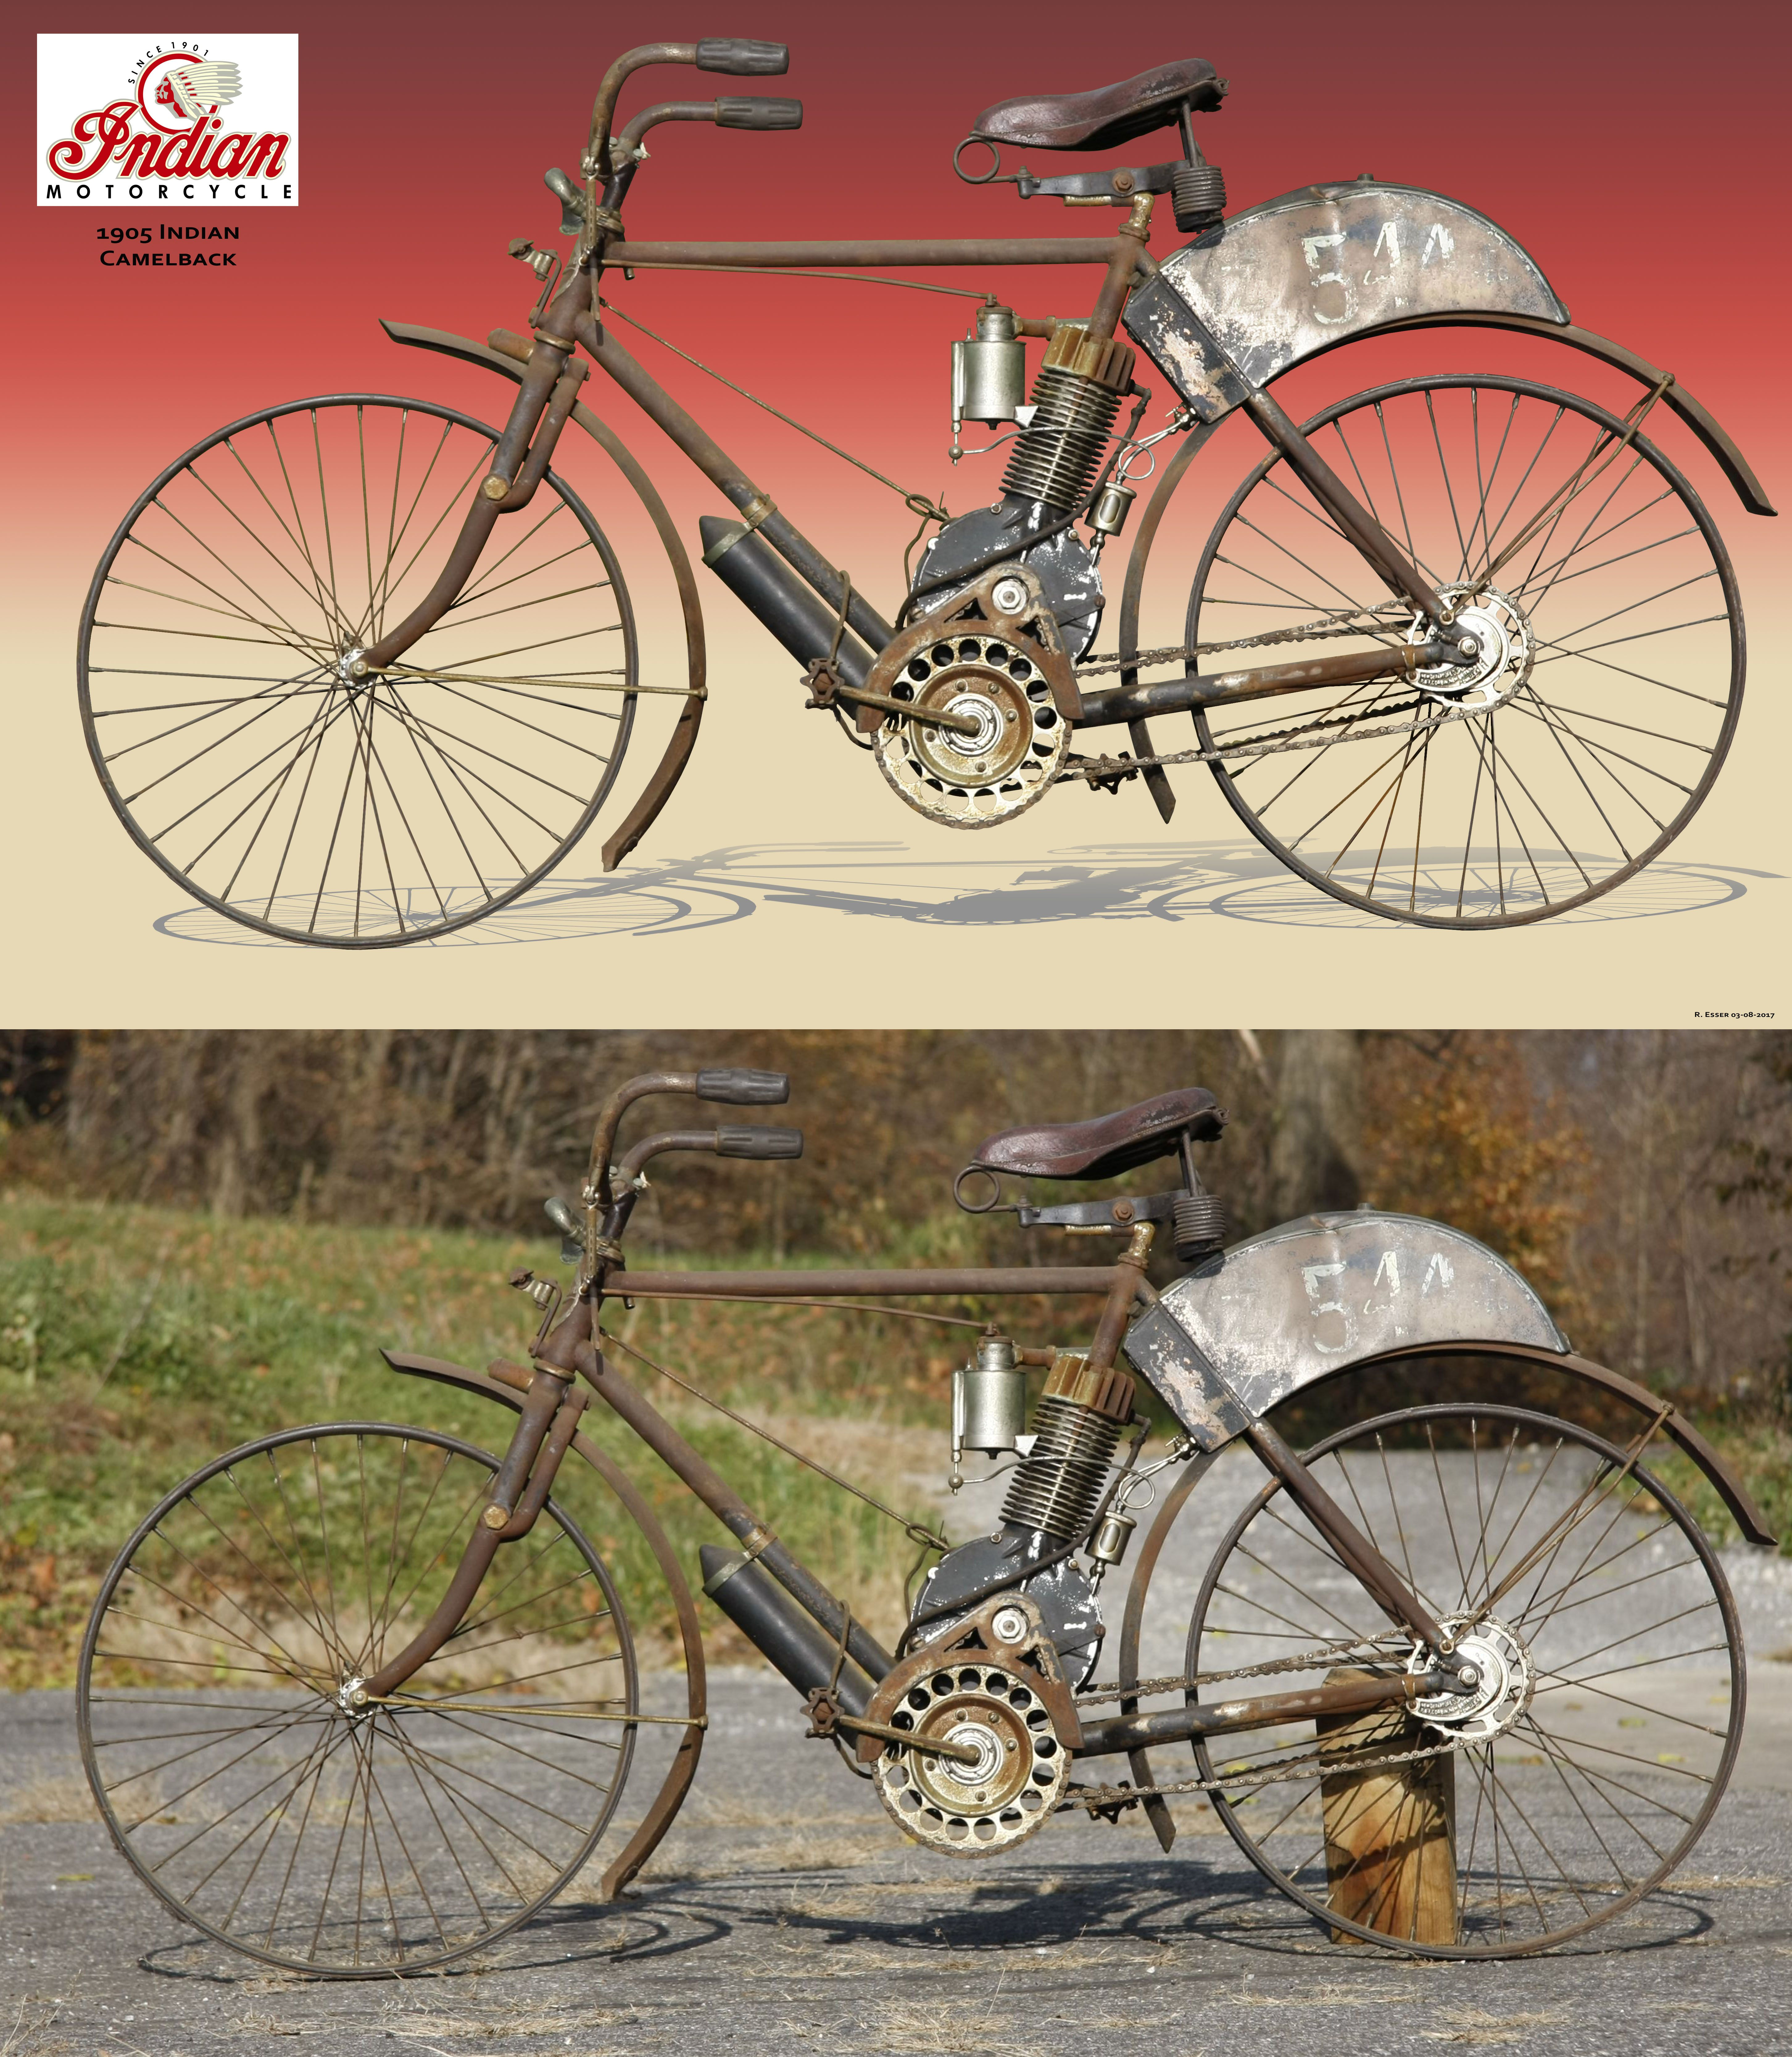 1905 Indian Camelback Motos Autos Viejitos